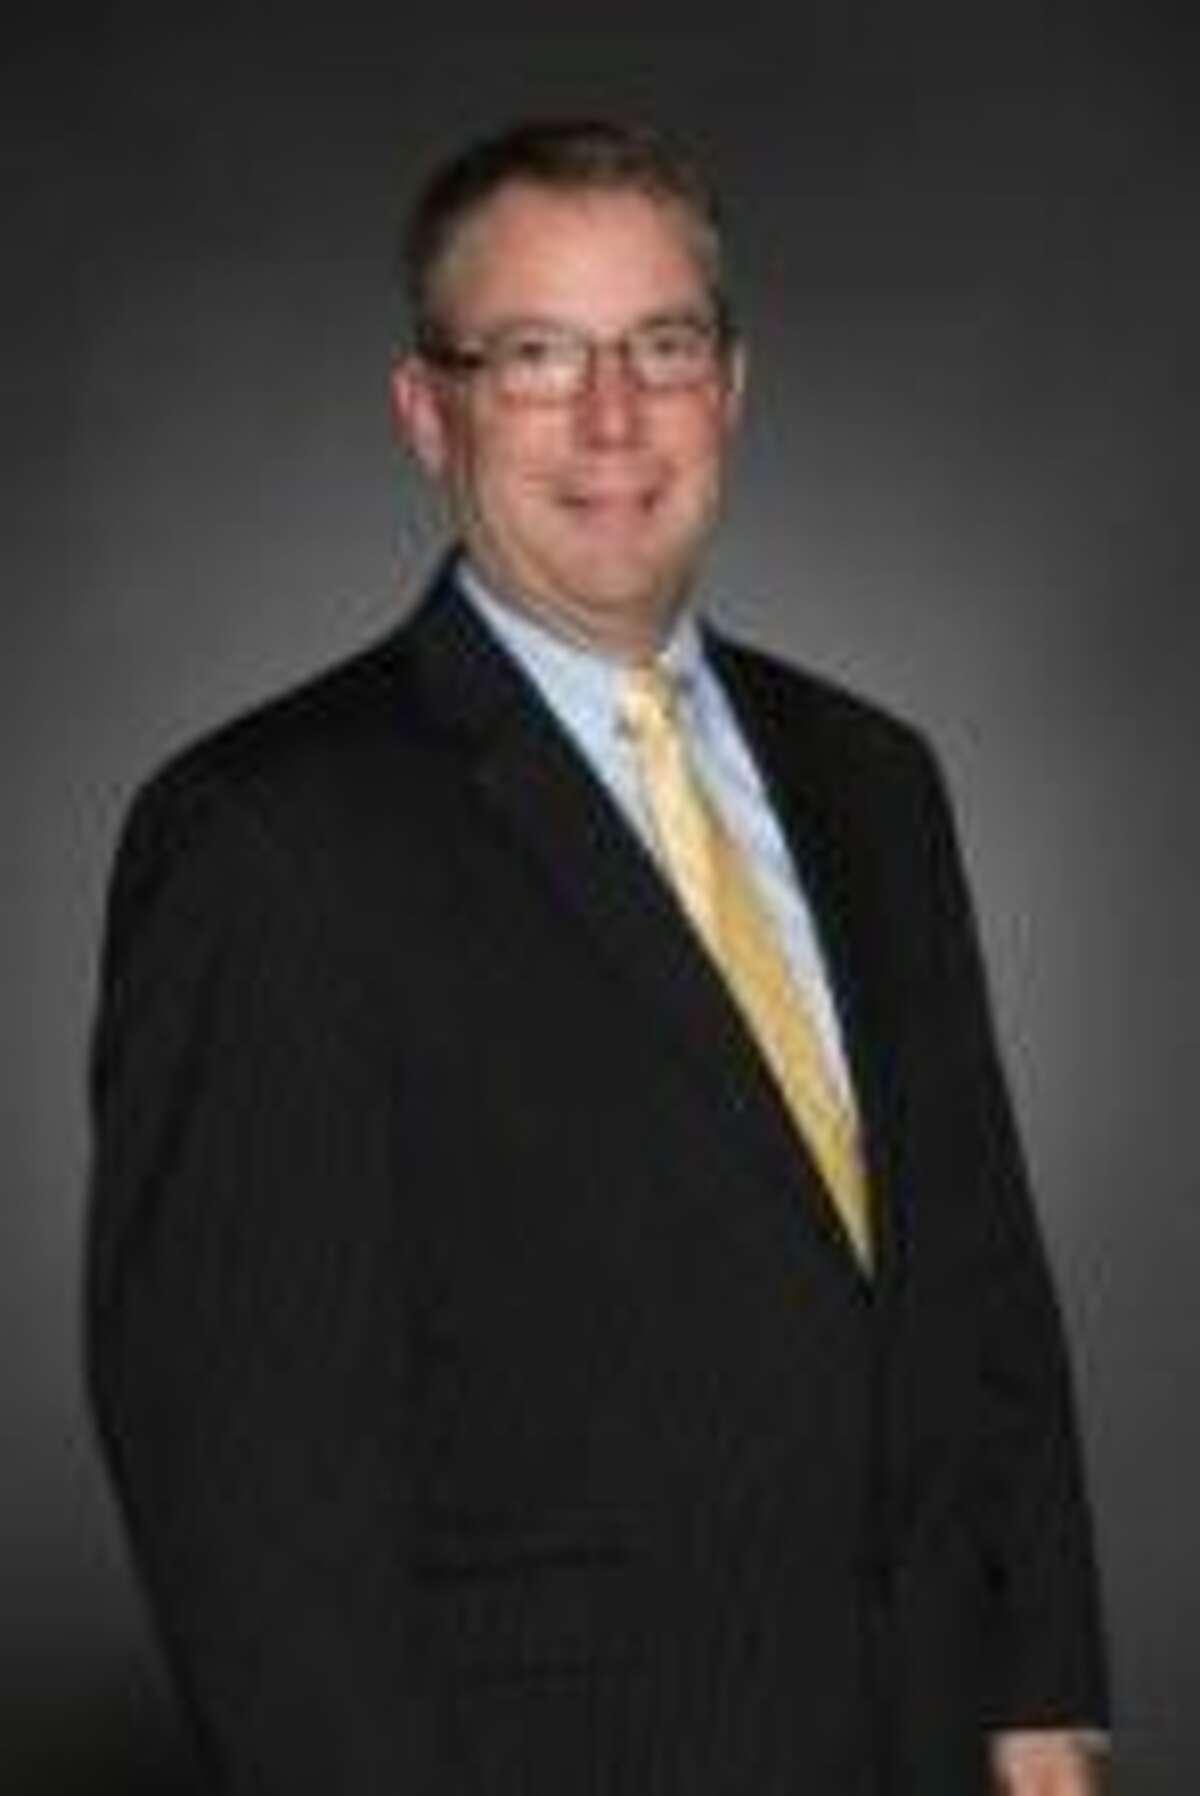 Doug Evans of the NENYPGA. (Courtesy of Capital Area Golf)